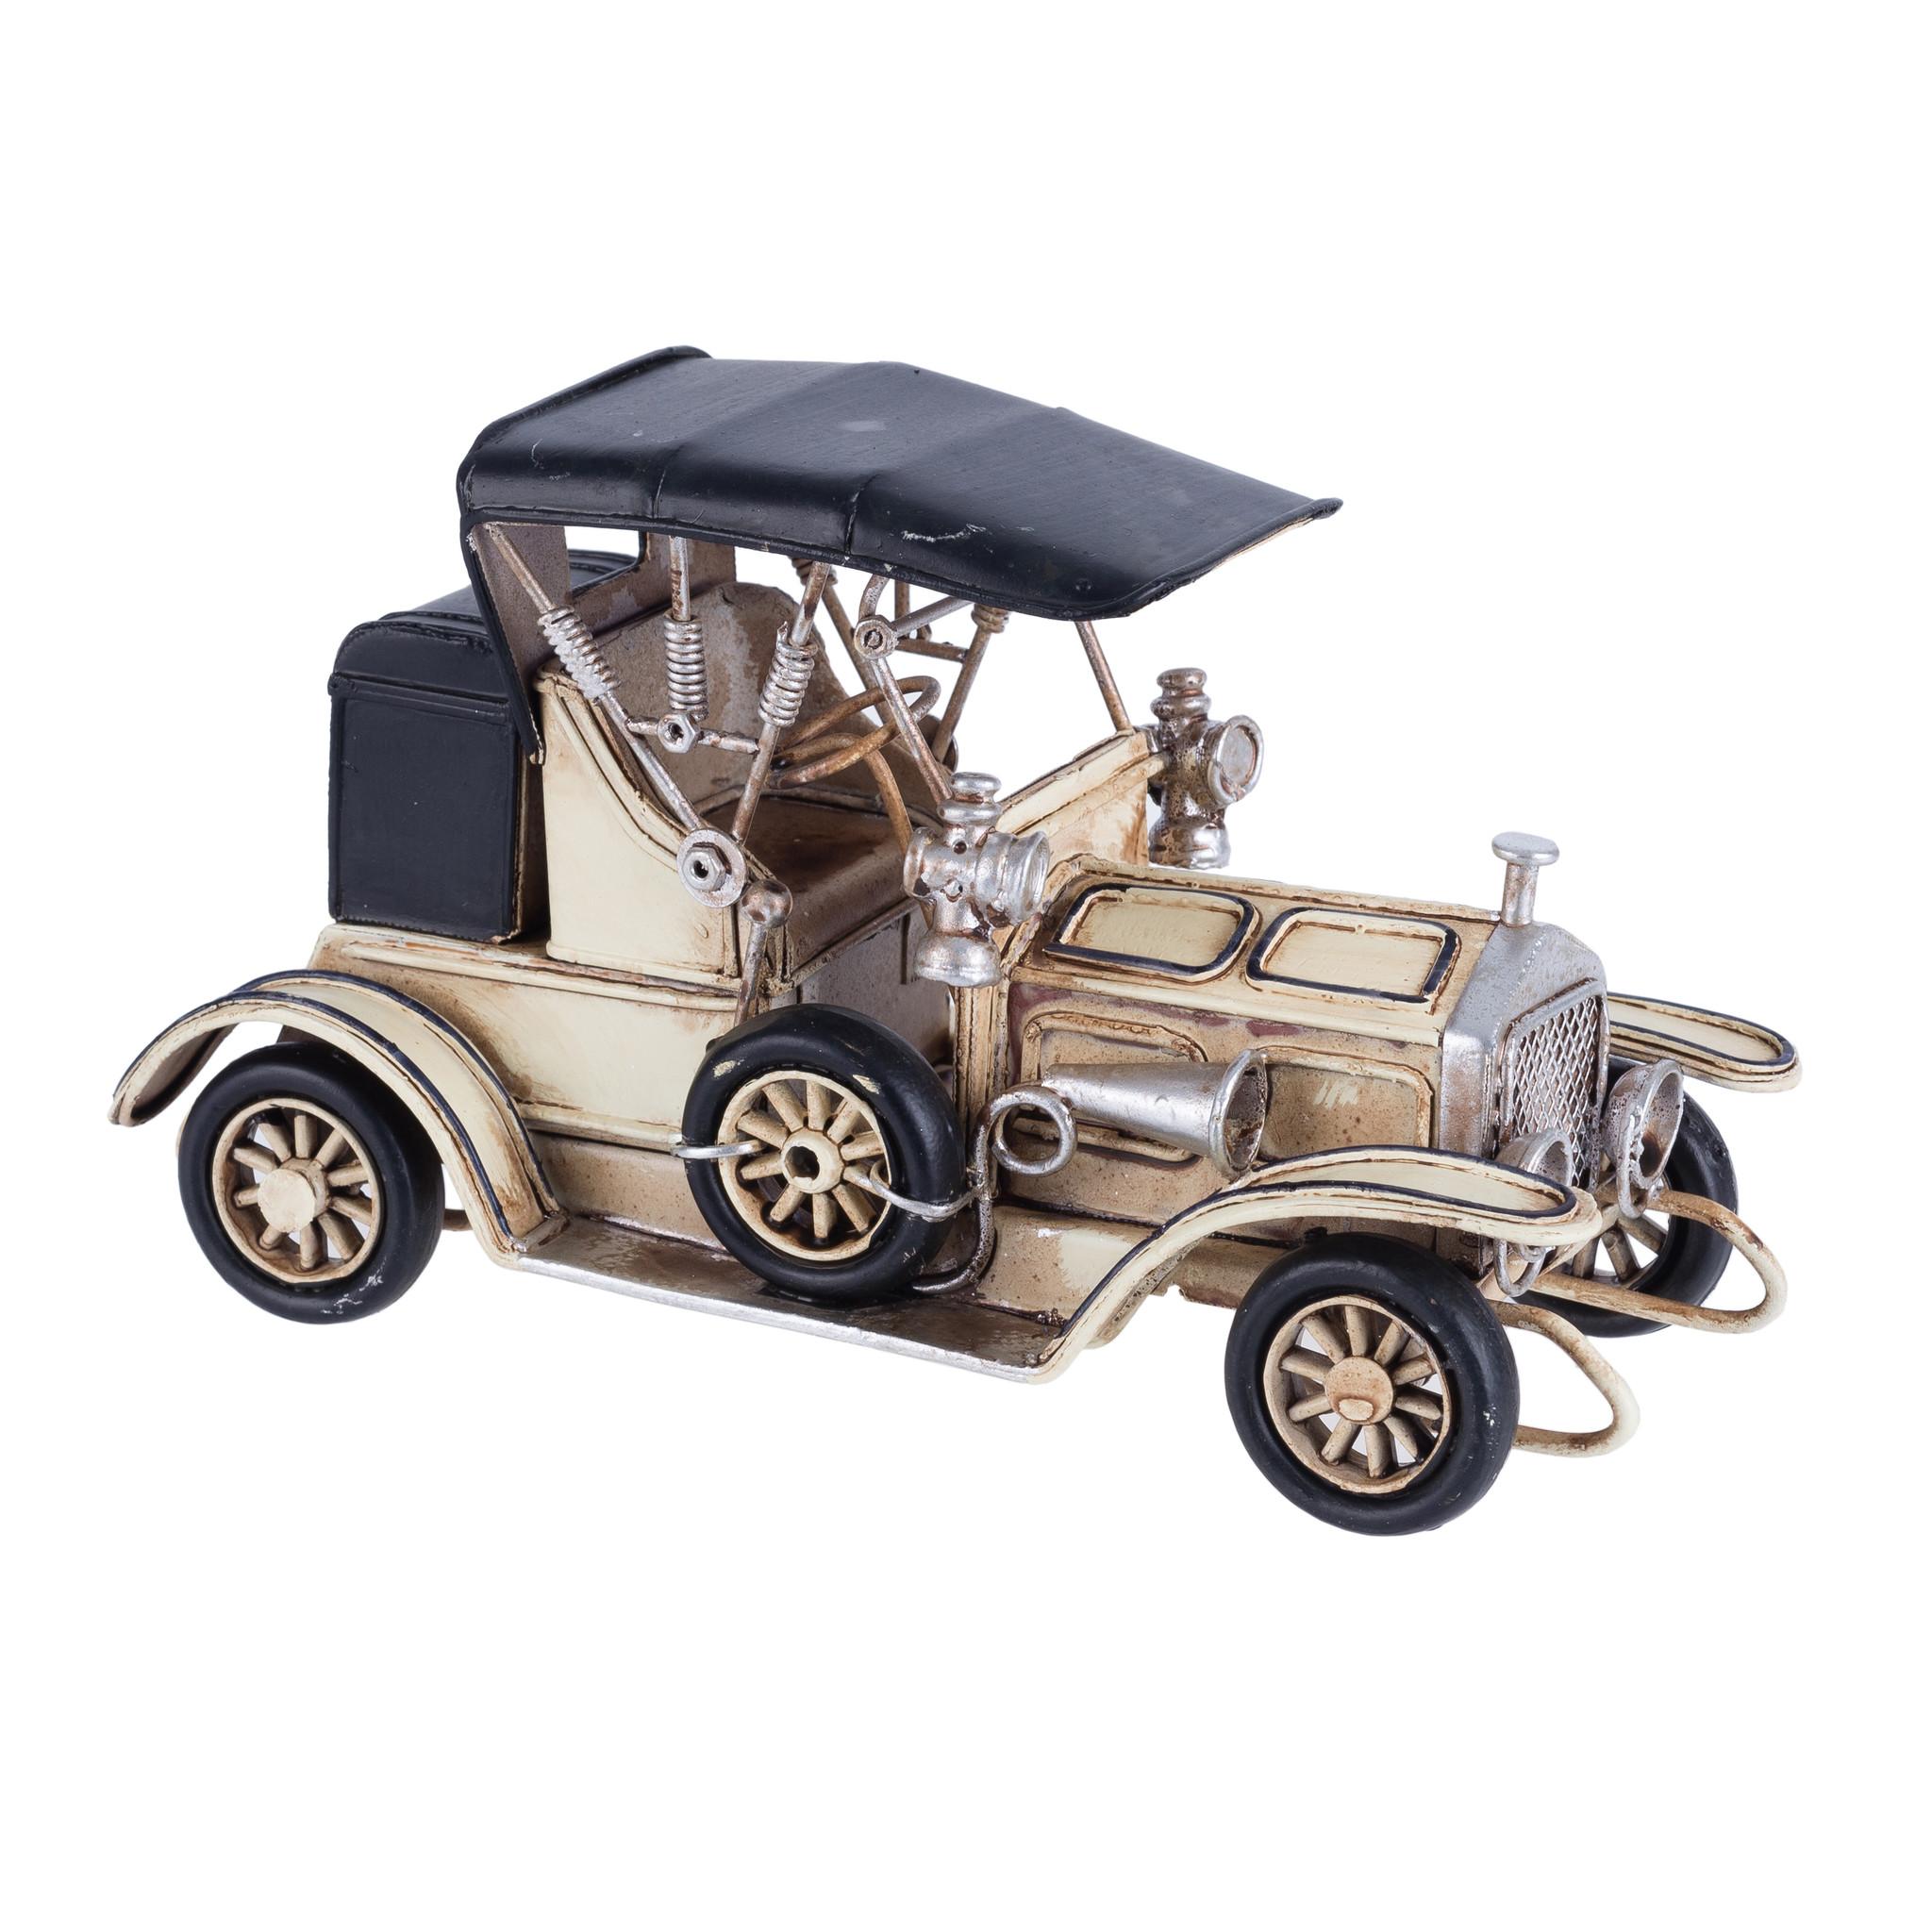 Декоративный автомобиль PinzoloДругое<br><br><br>Material: Металл<br>Width см: 16<br>Depth см: 6<br>Height см: 10